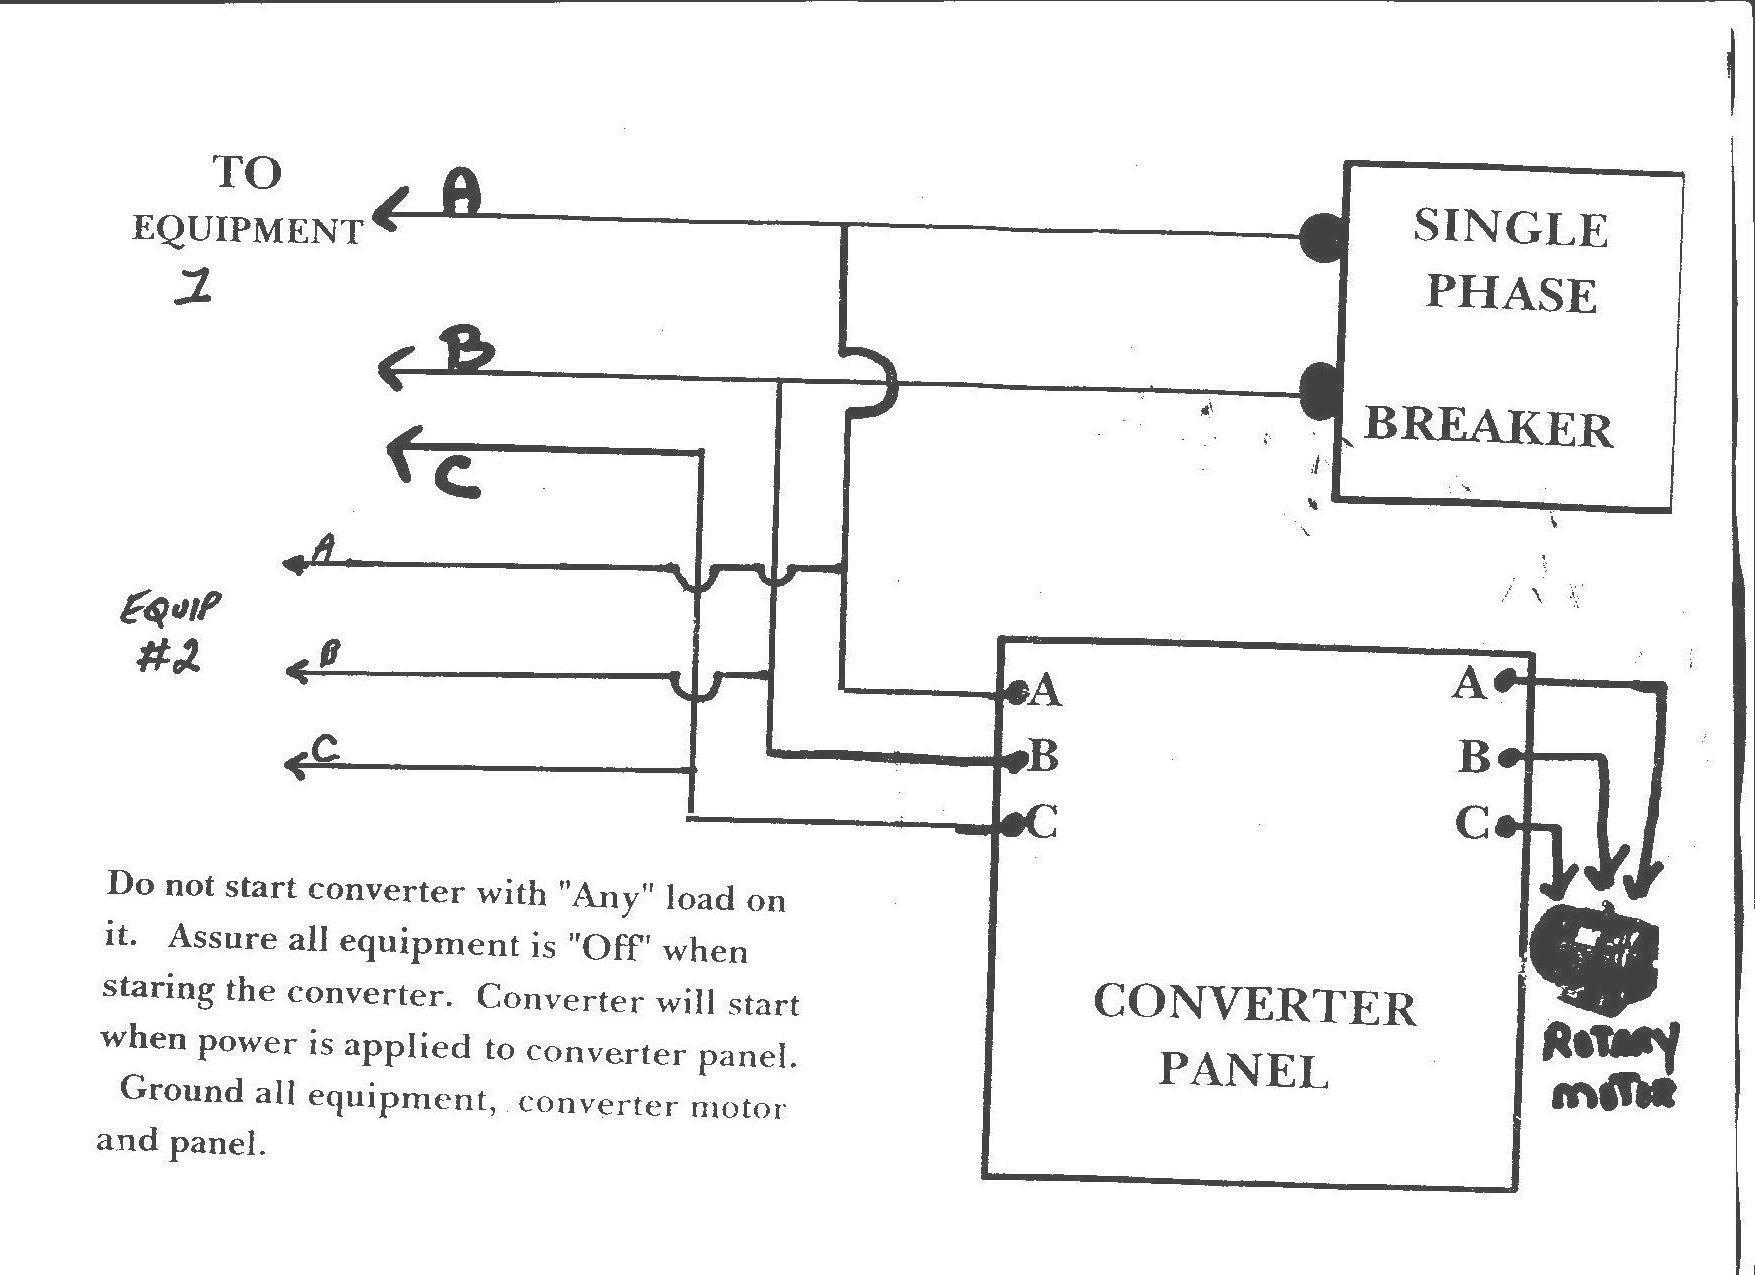 [FPWZ_2684]  Ronk Wiring Diagram - 1968 Chevy Starter Wiring Diagram for Wiring Diagram  Schematics | Arco Rotary Phase Converter Wiring Diagram |  | Wiring Diagram Schematics